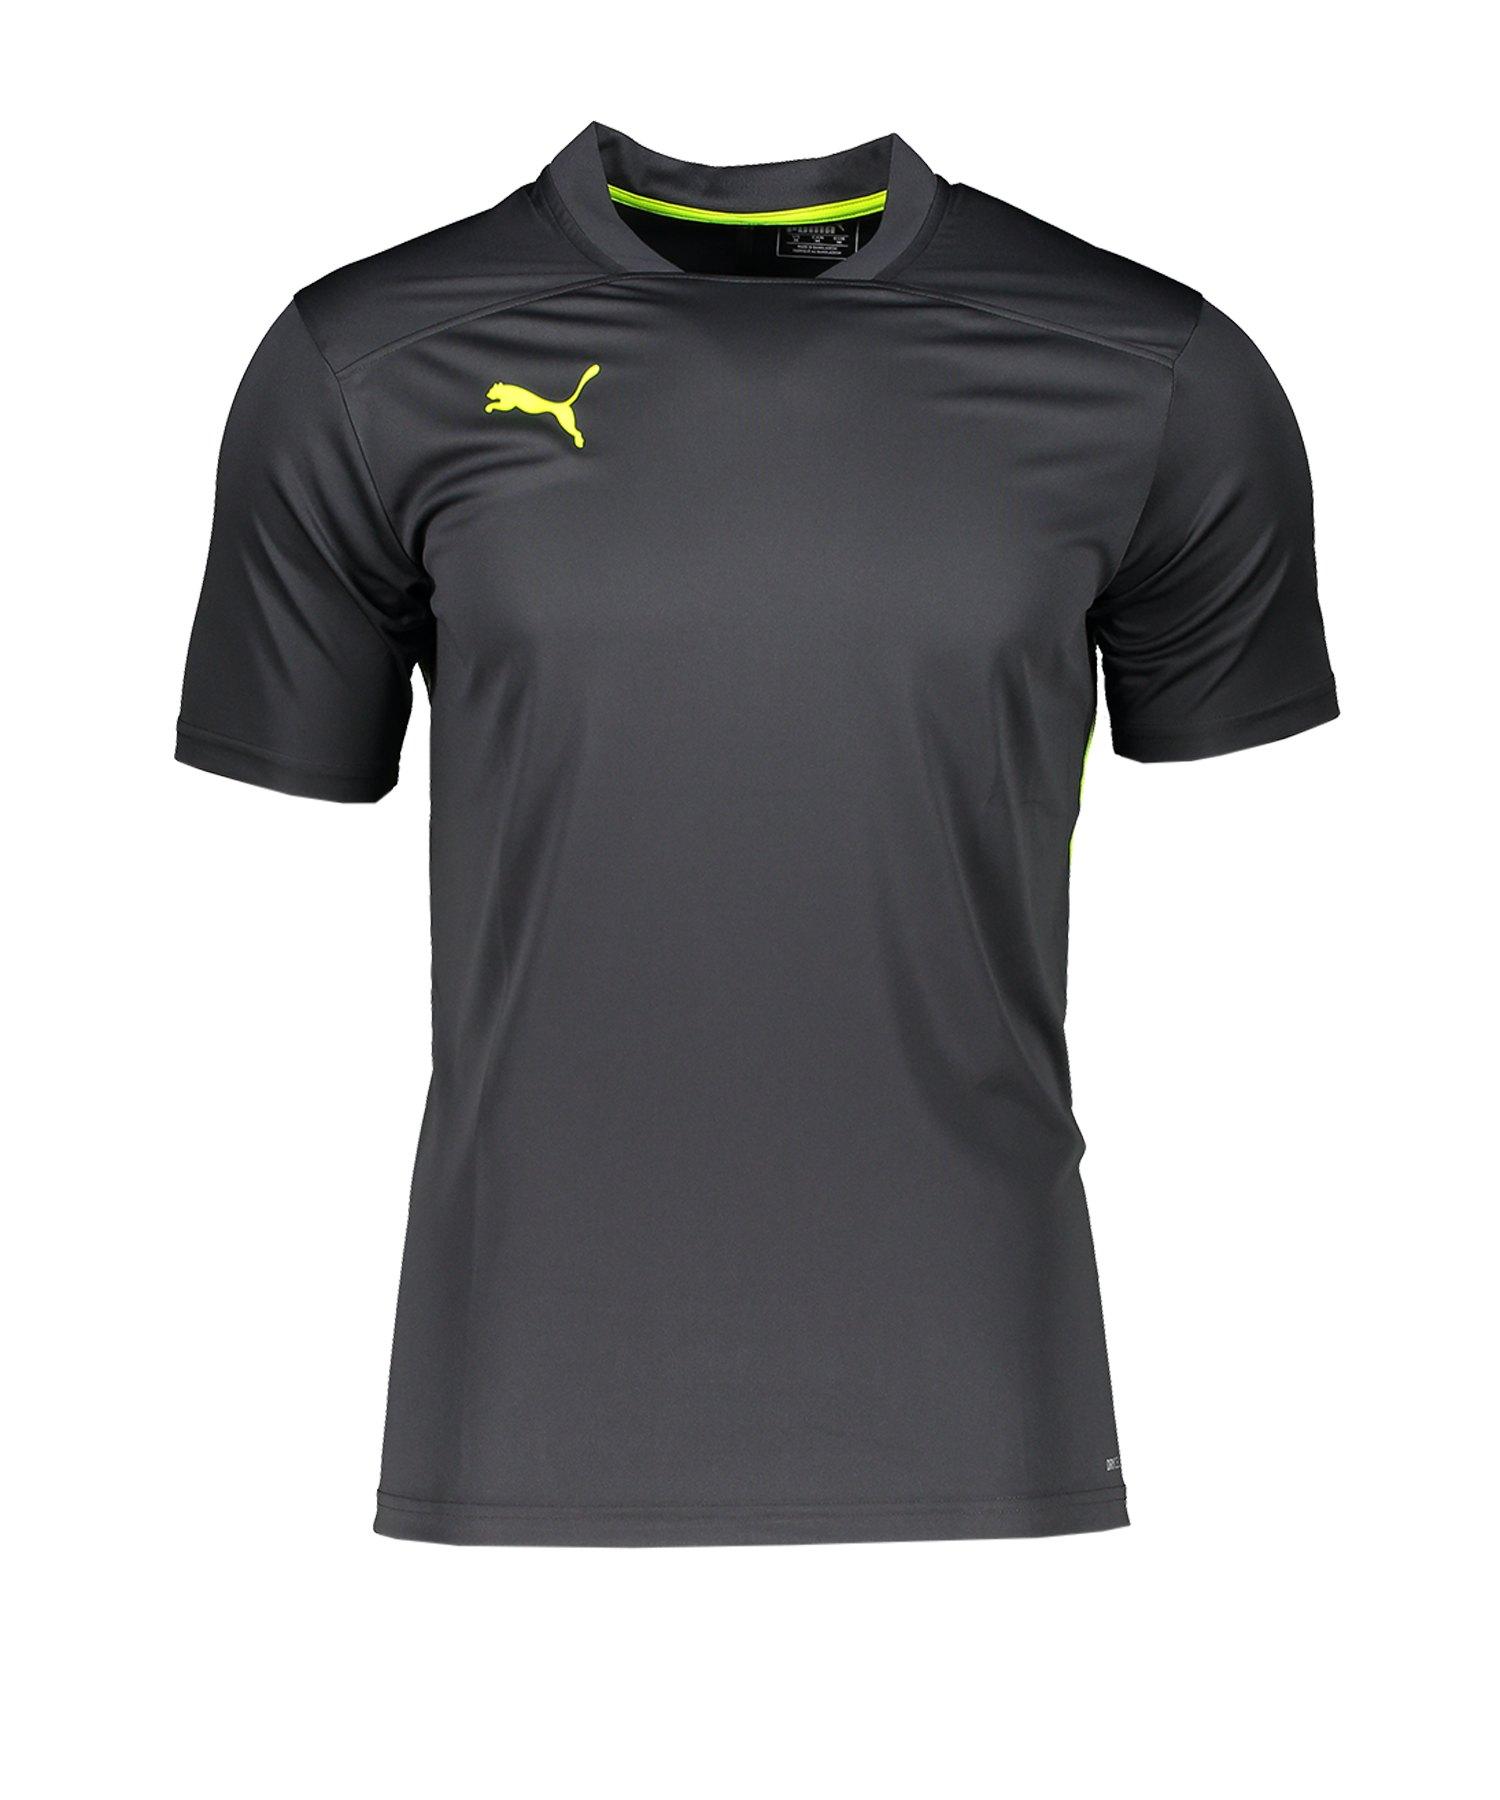 PUMA ftblNXT Shirt Schwarz Gelb F002 - schwarz